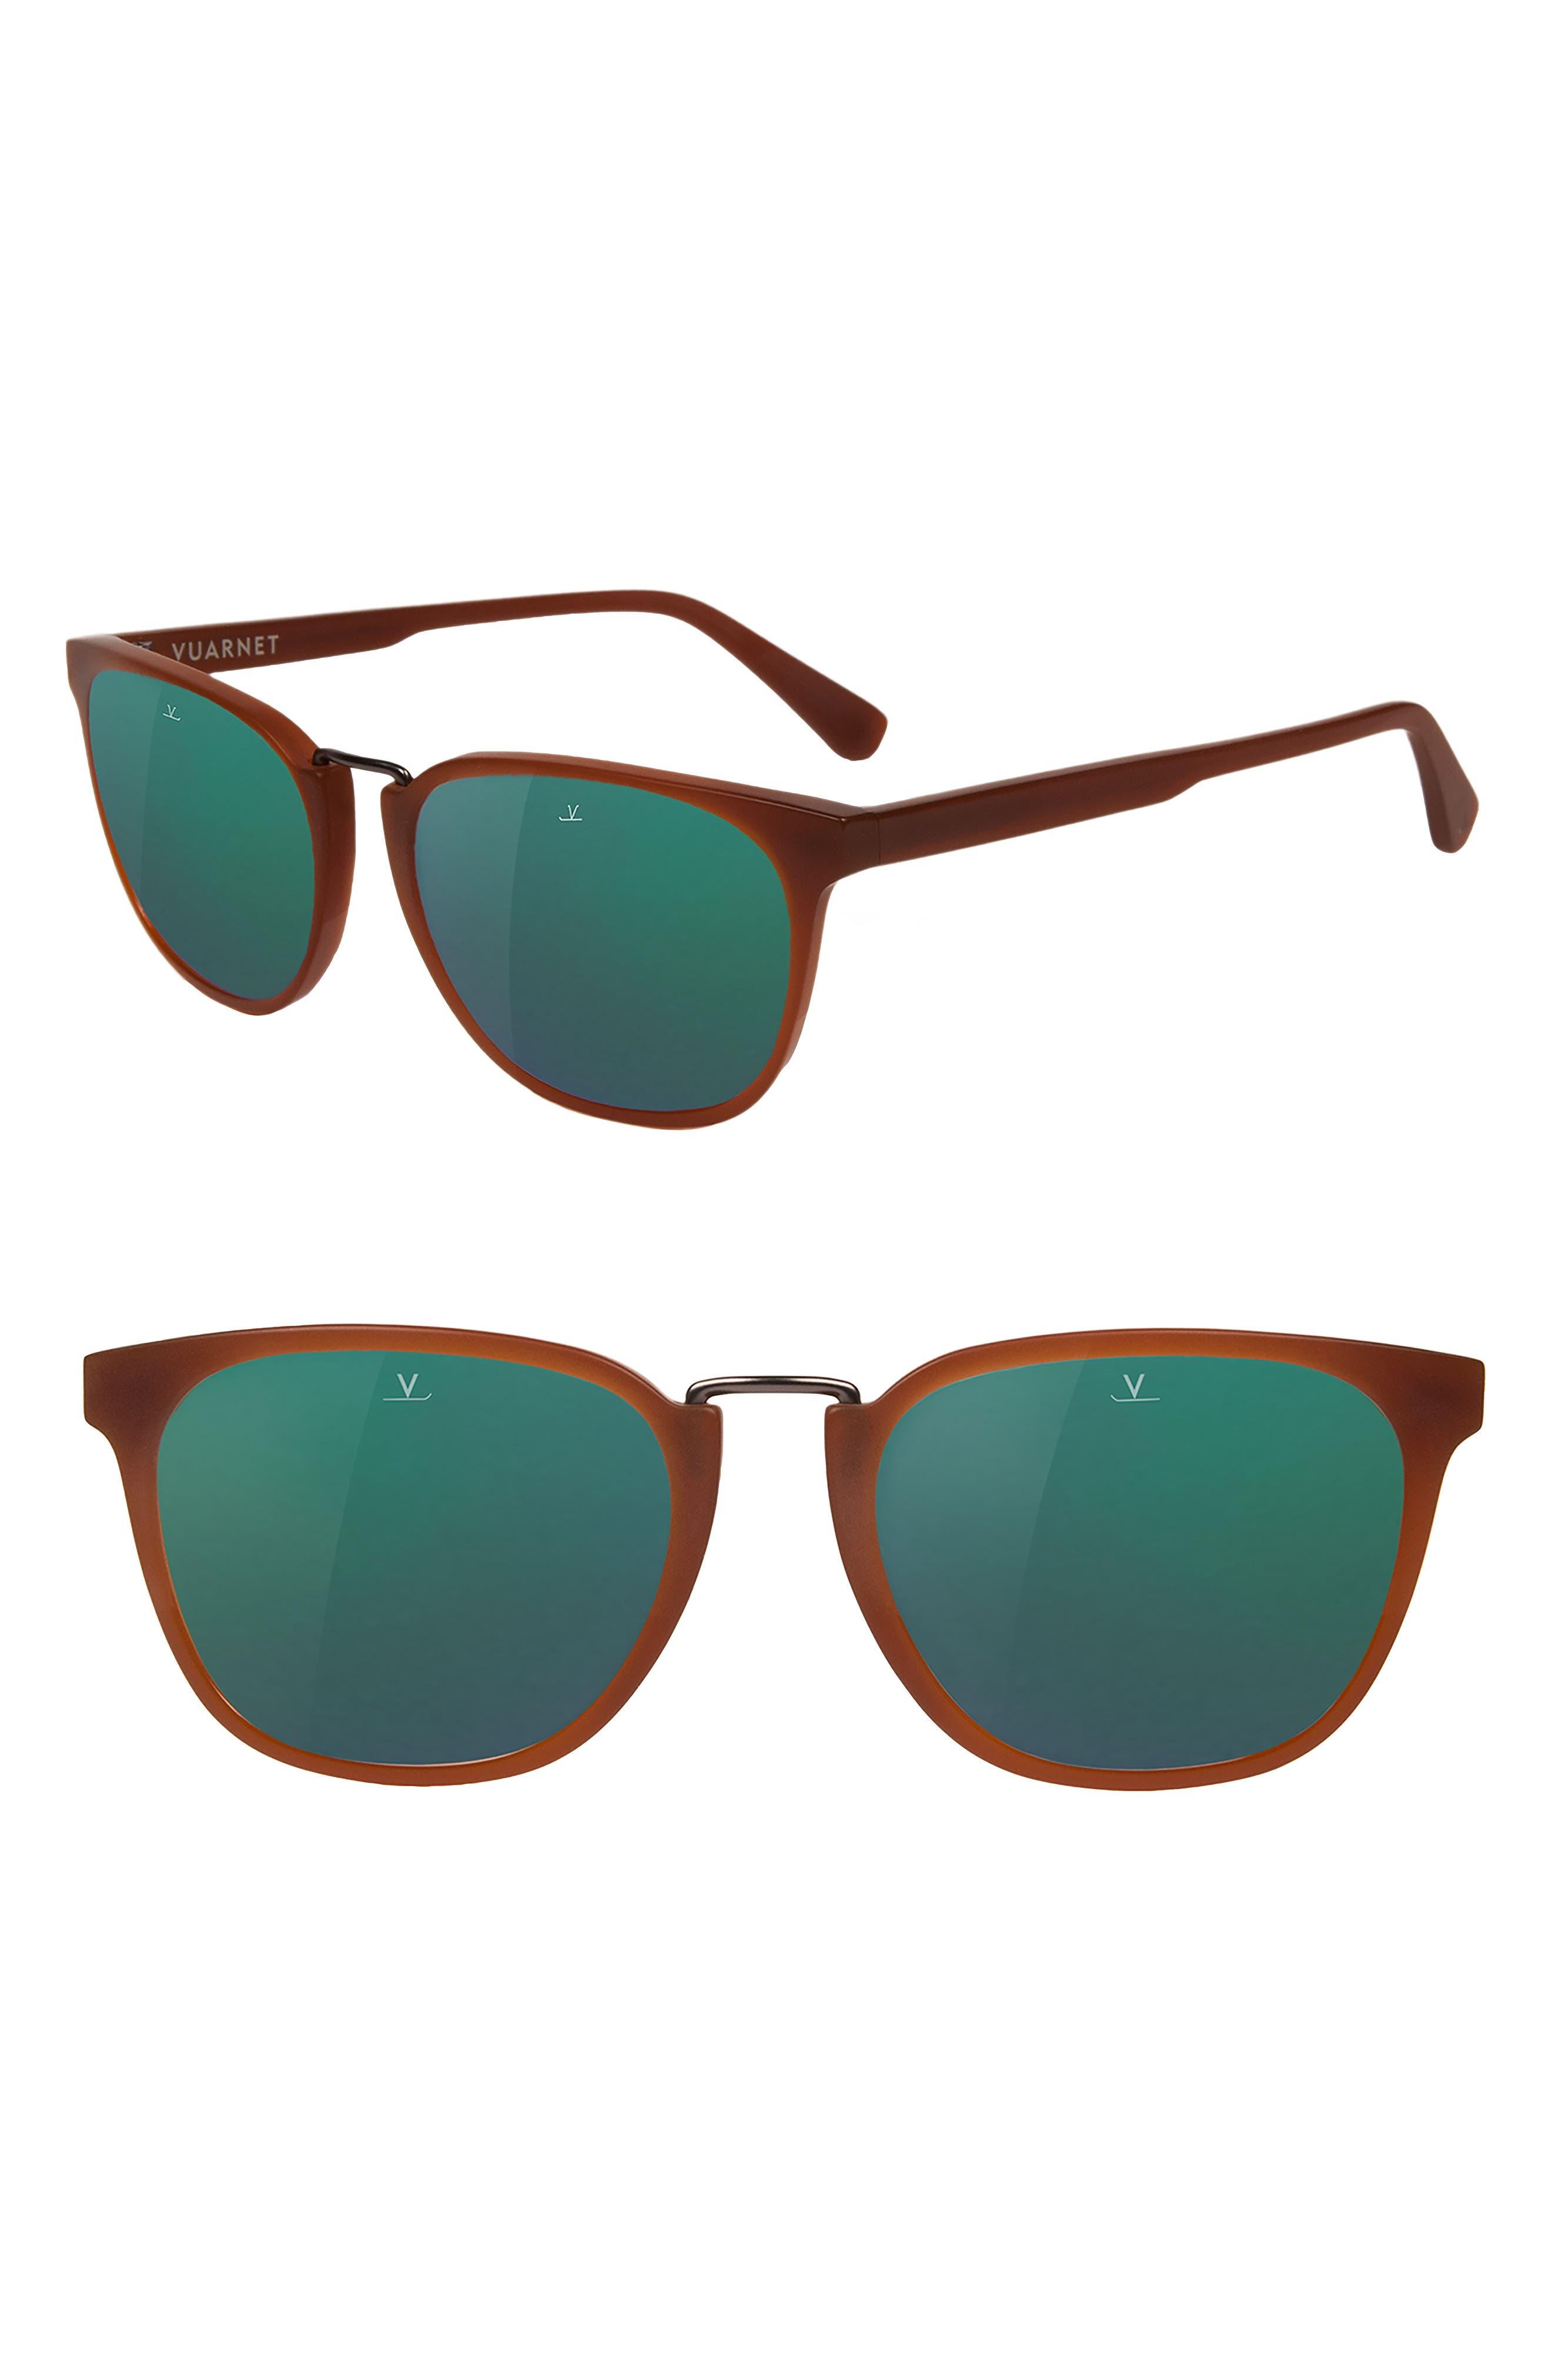 Cable Car 54mm Sunglasses,                             Main thumbnail 1, color,                             COGNAC / GREY GREEN FLASH